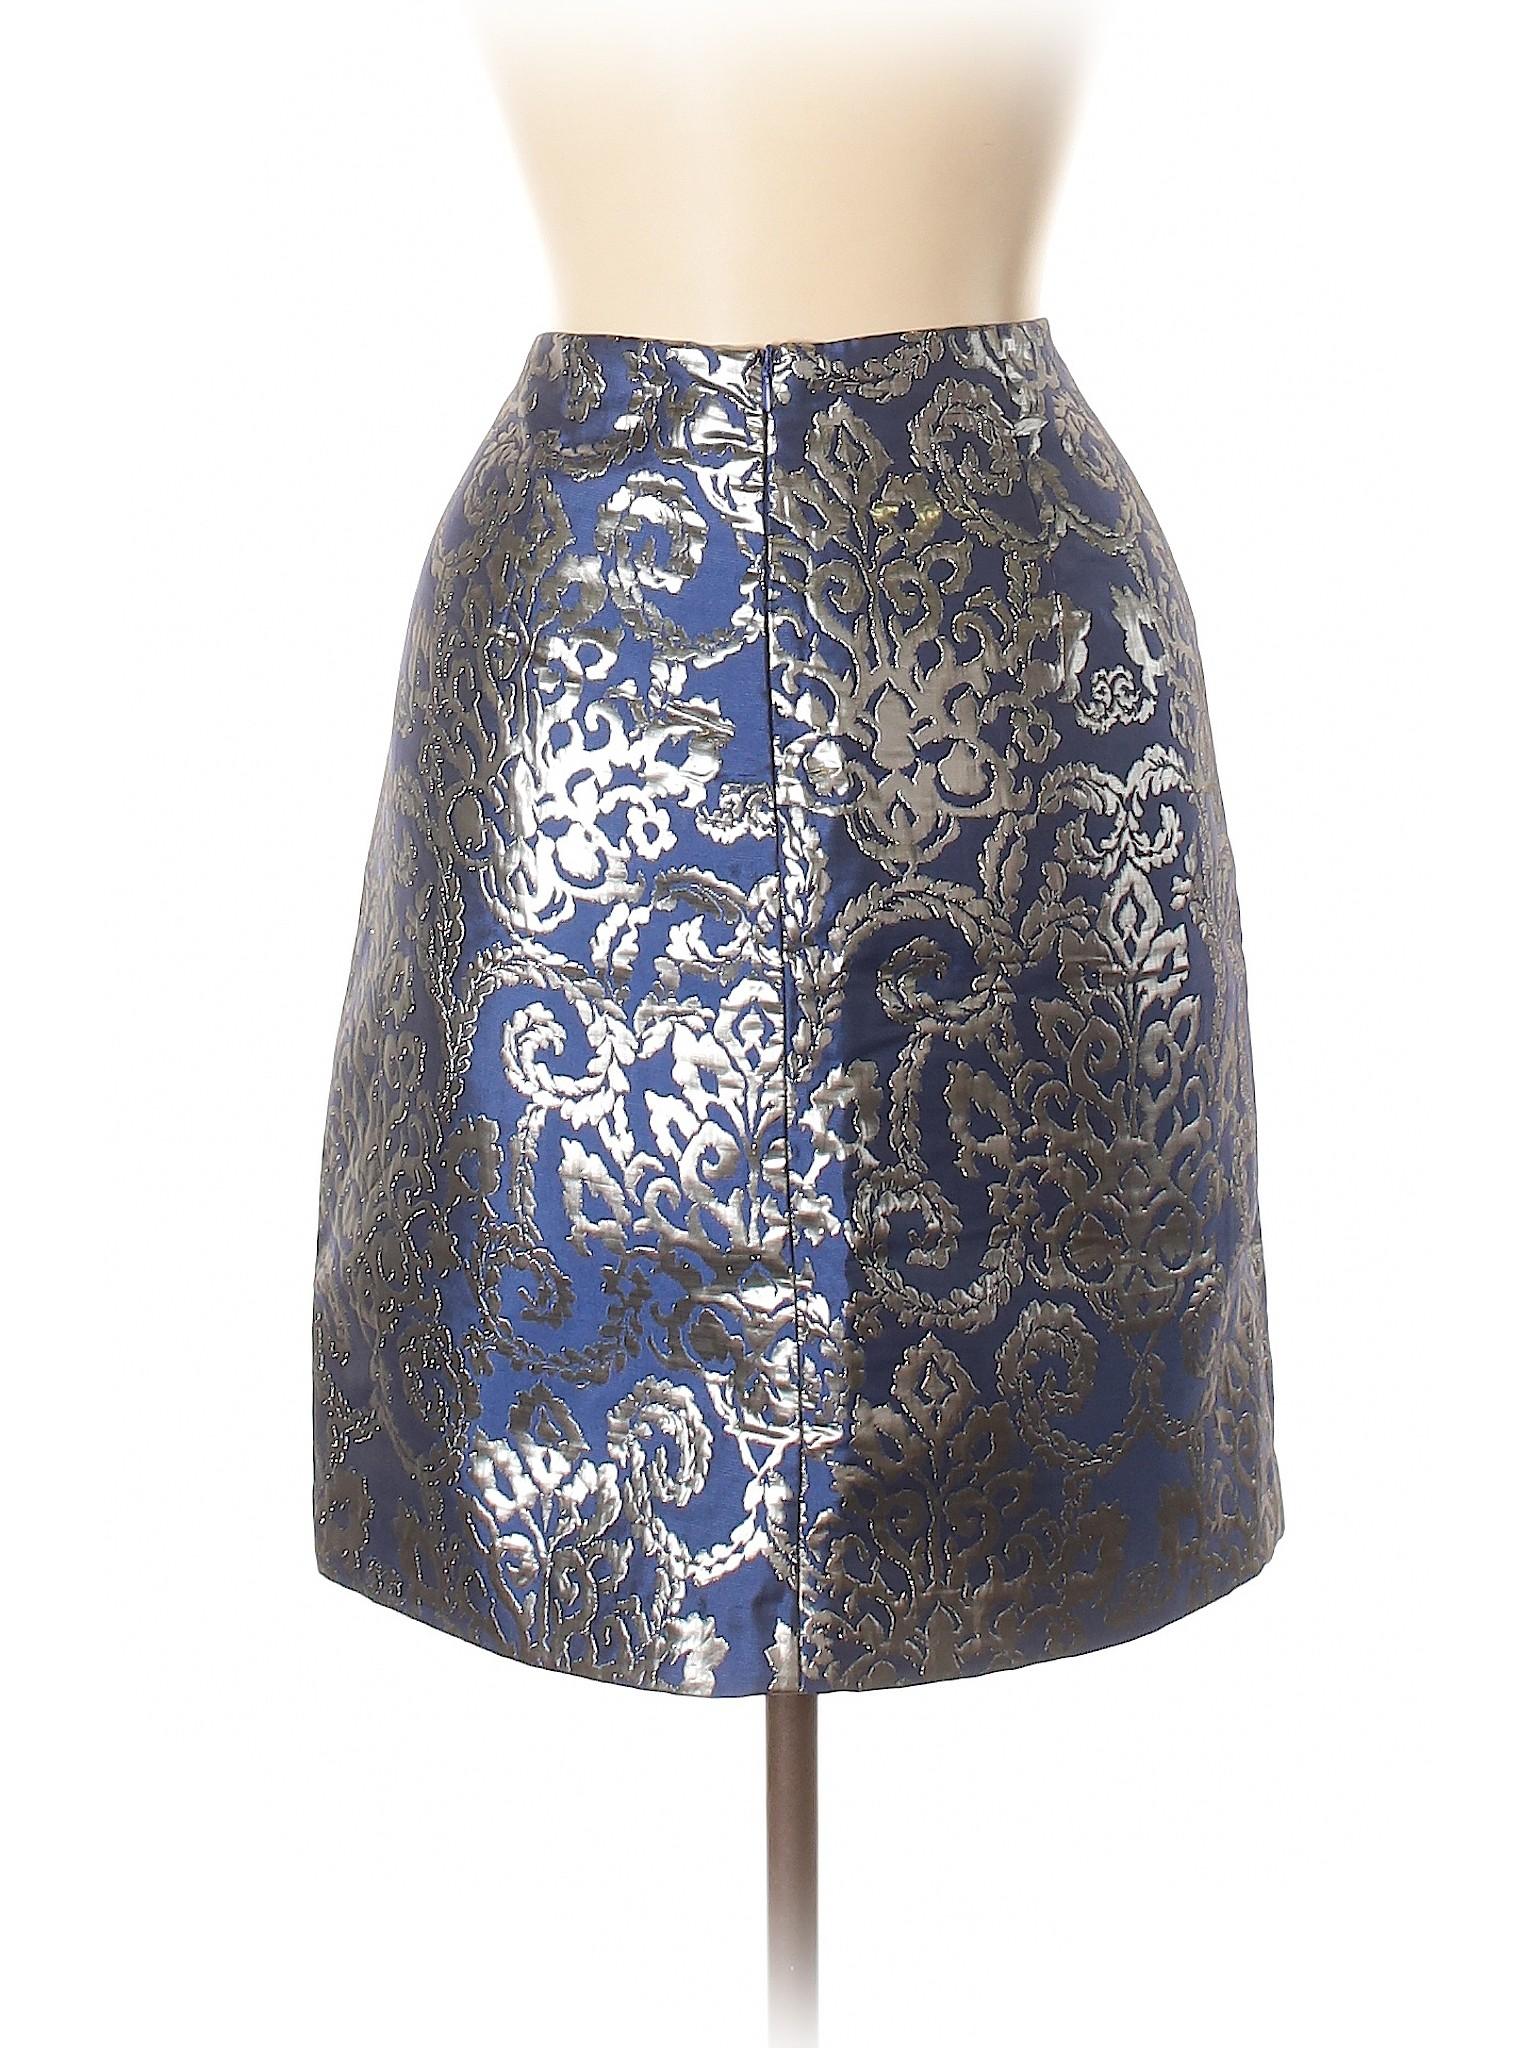 Boutique Skirt Boutique Skirt Boutique Formal Formal Skirt Boutique Formal YwC18U